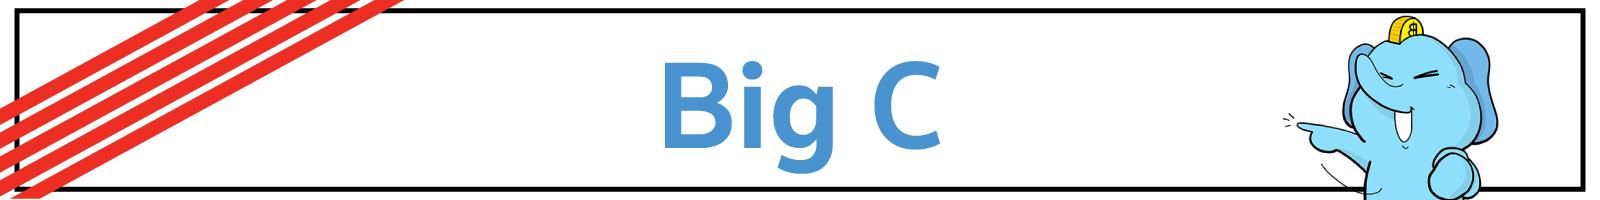 %e0%b8%ab%e0%b8%b1%e0%b8%a7%e0%b8%82%e0%b9%89%e0%b8%ad-big-c